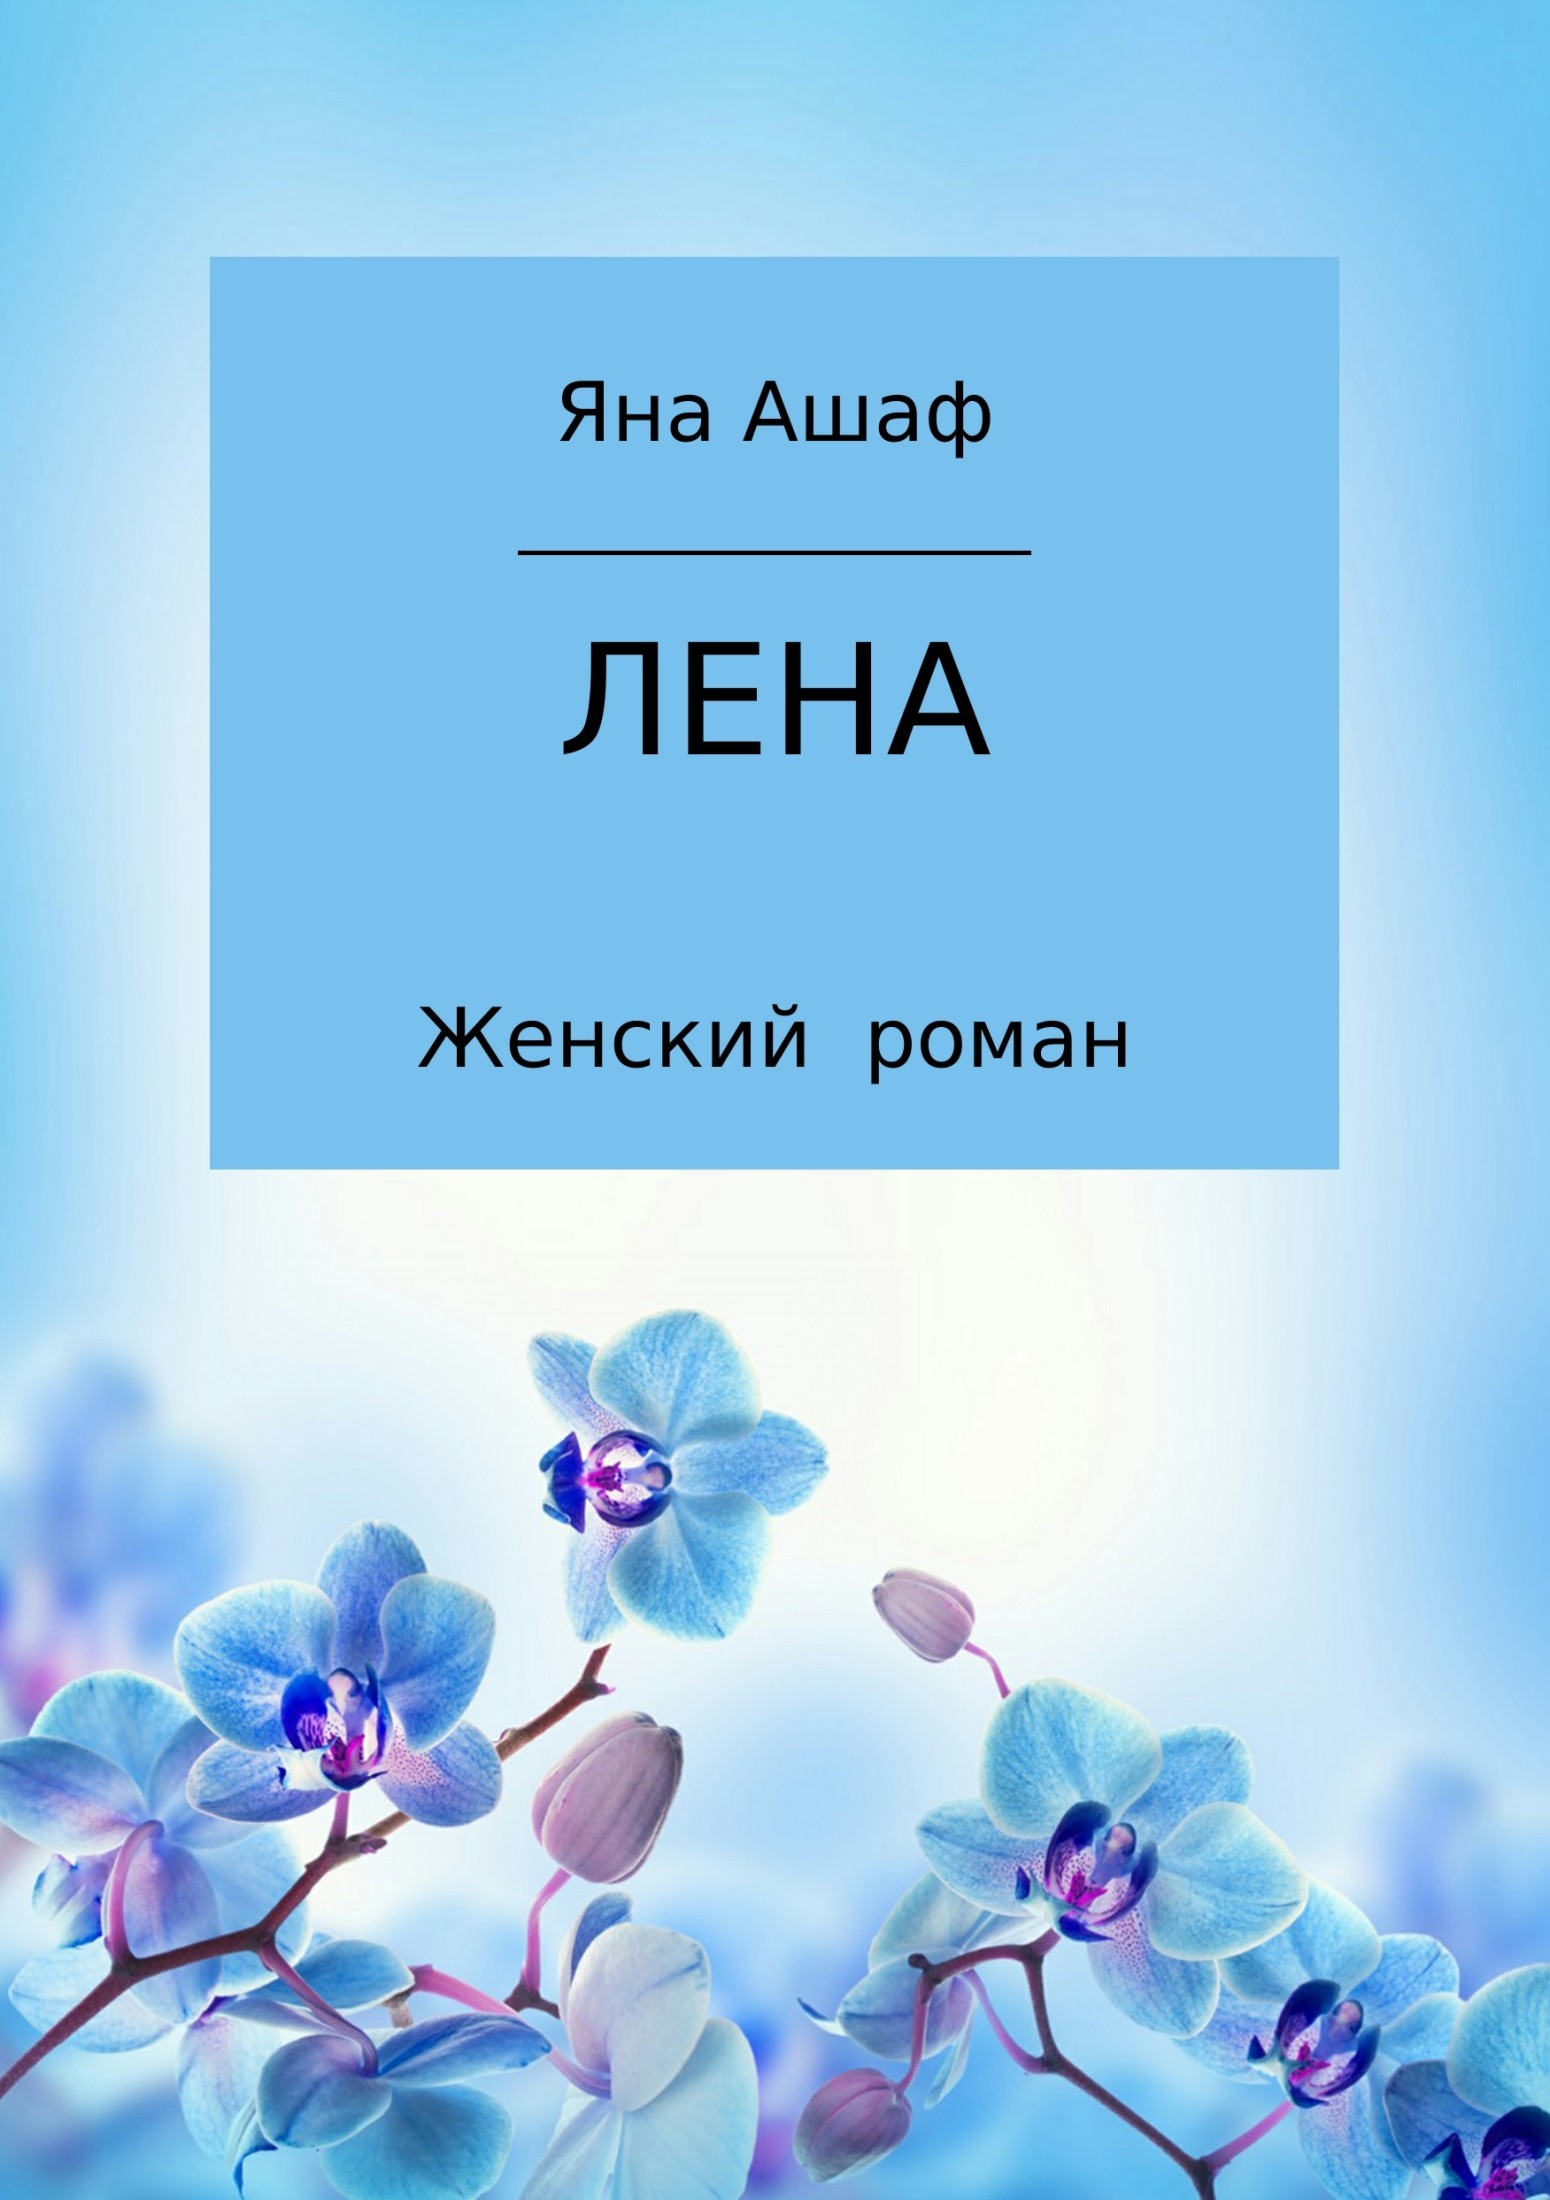 Яна Ашаф. Лена